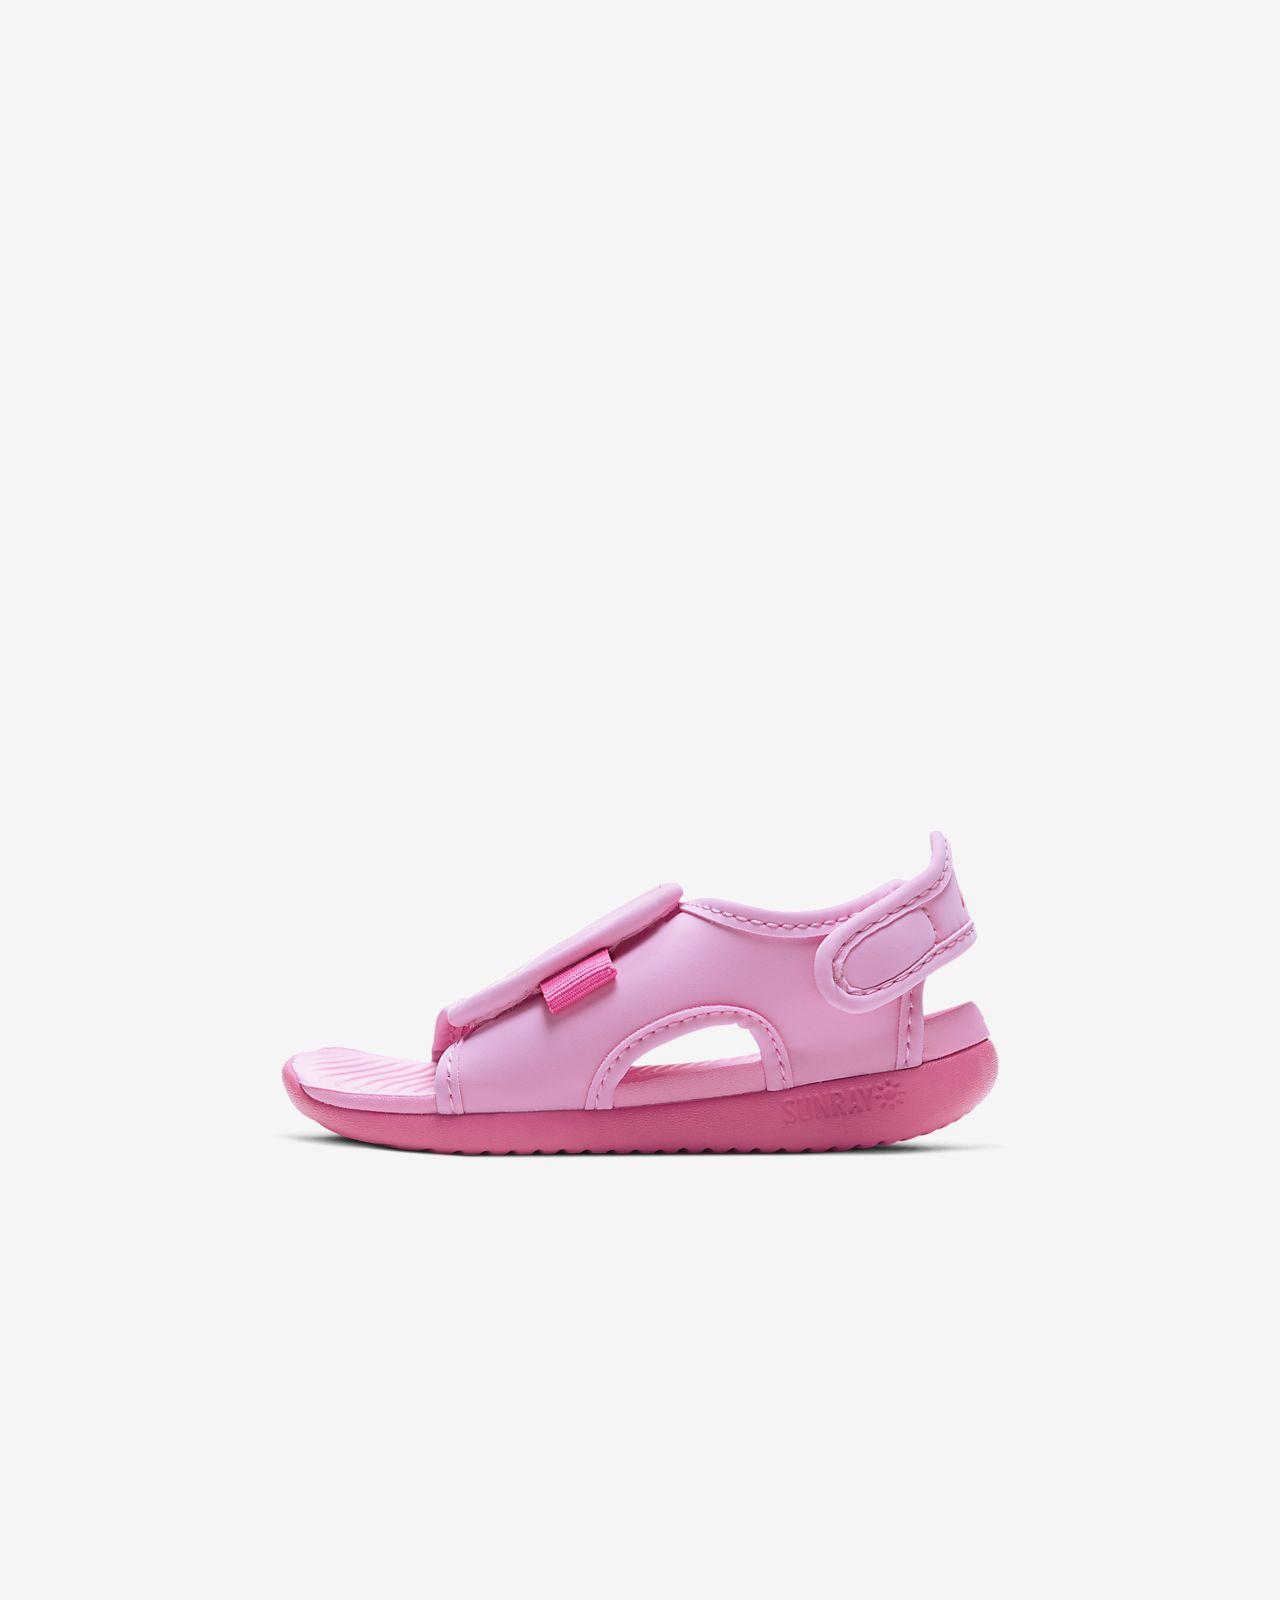 Nike Sunray Adjust 5 V2 Baby and Toddler Sandal